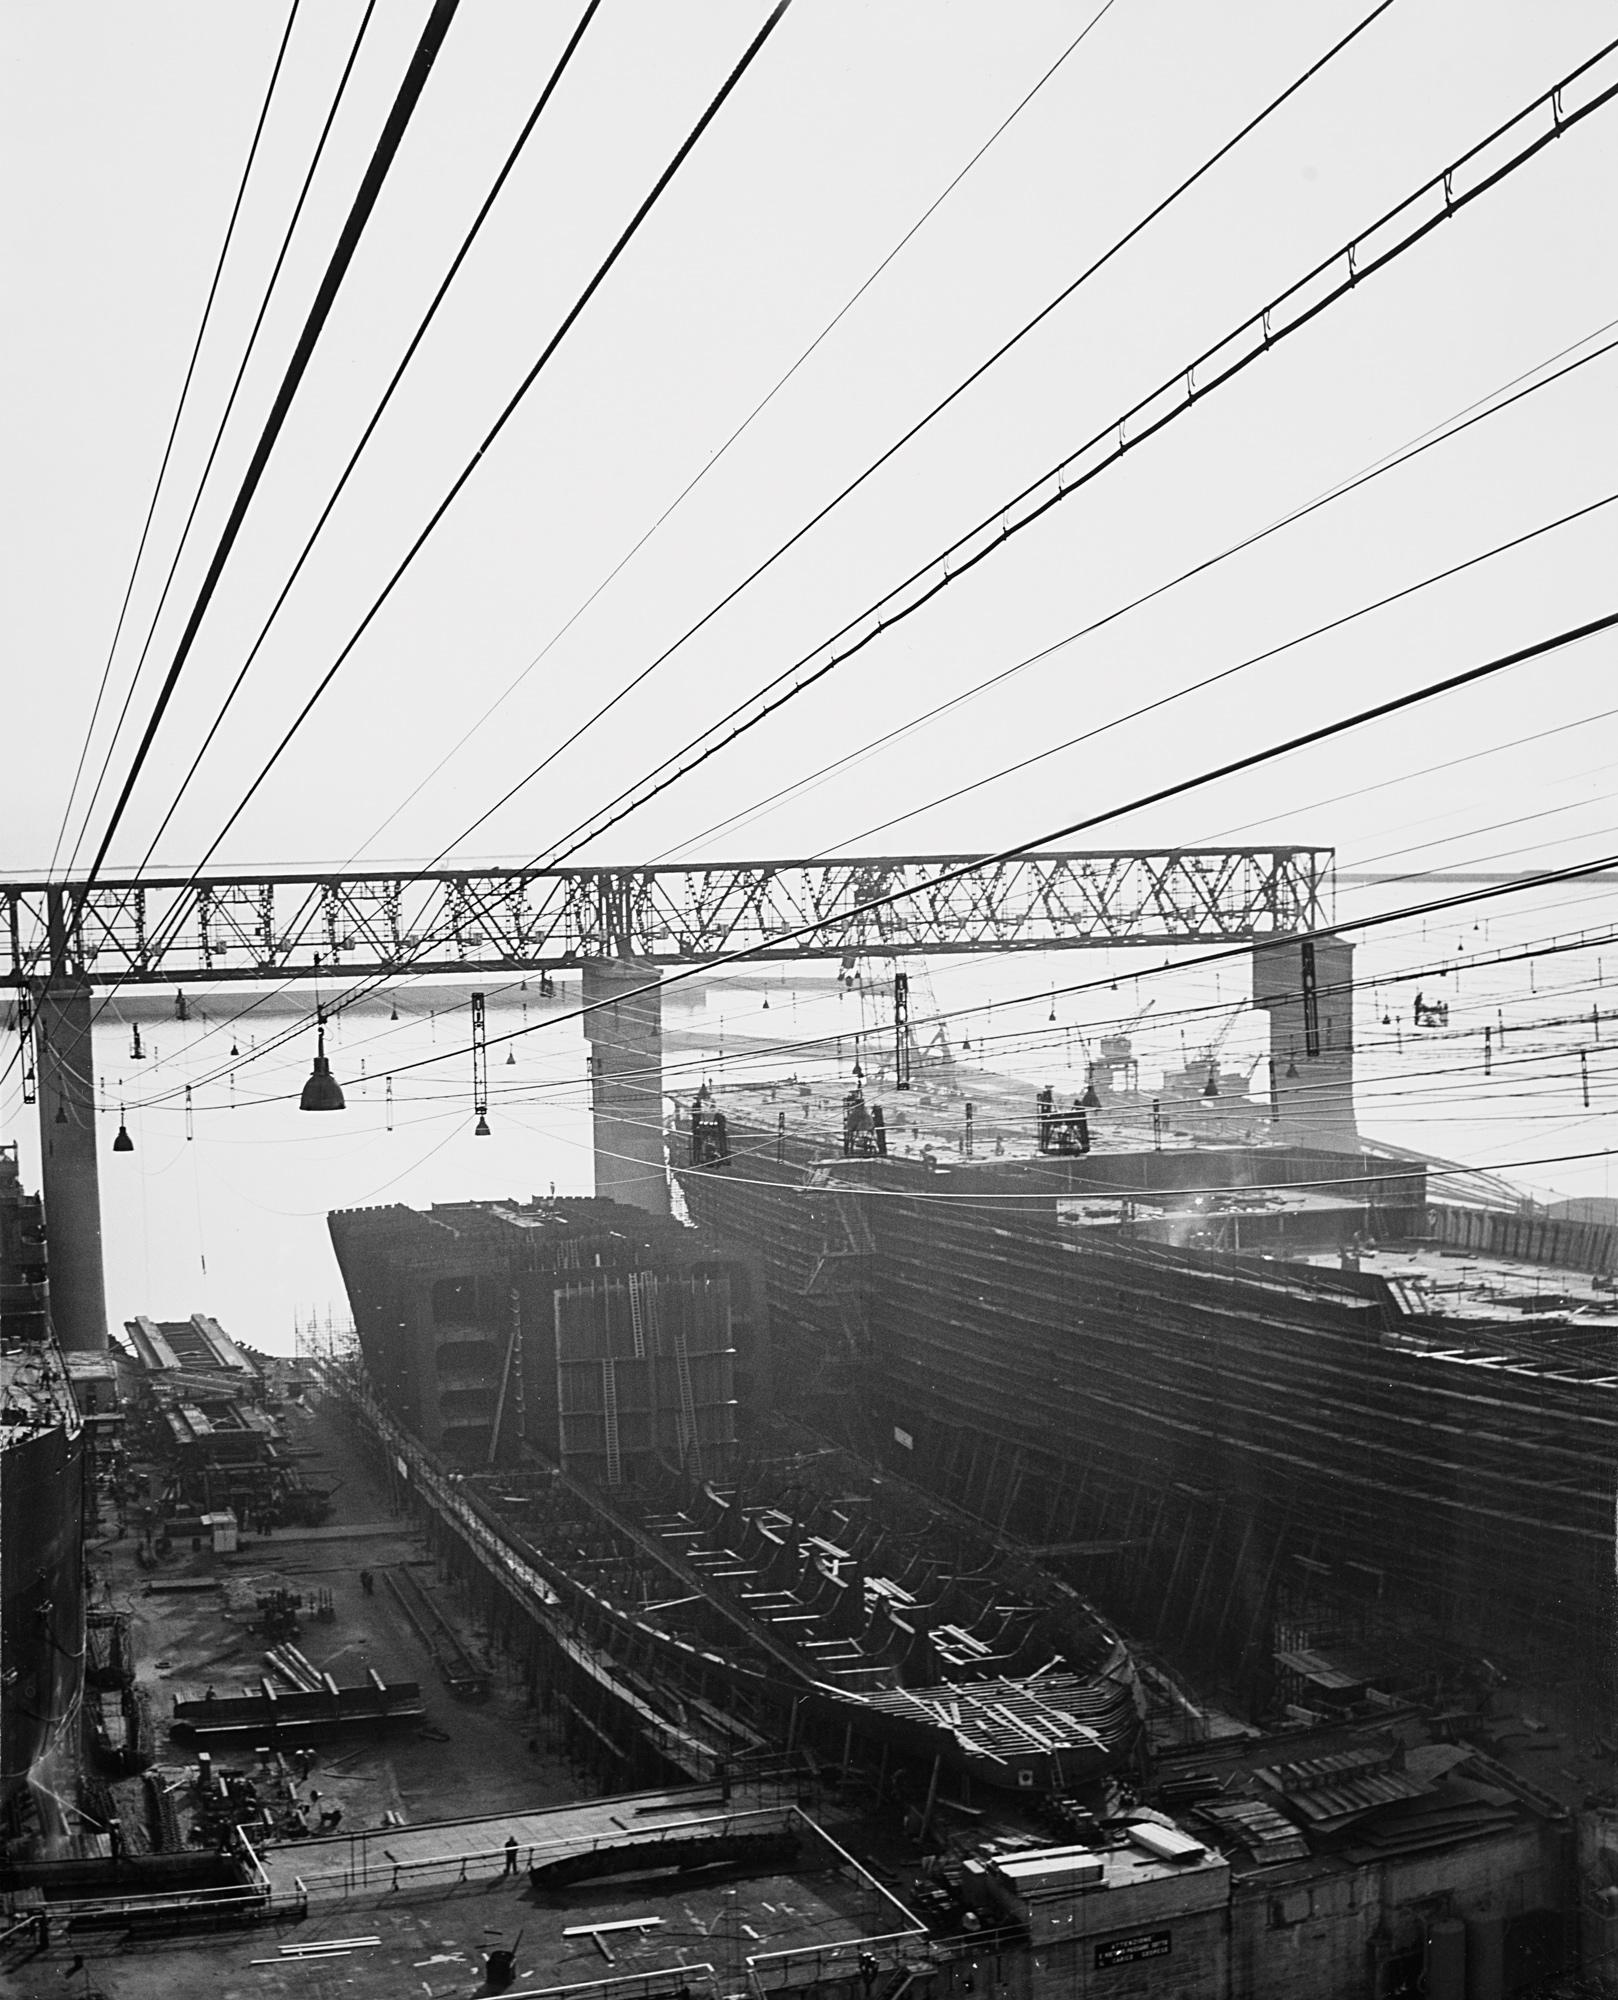 Cantieri navali, Genova, anni 1950